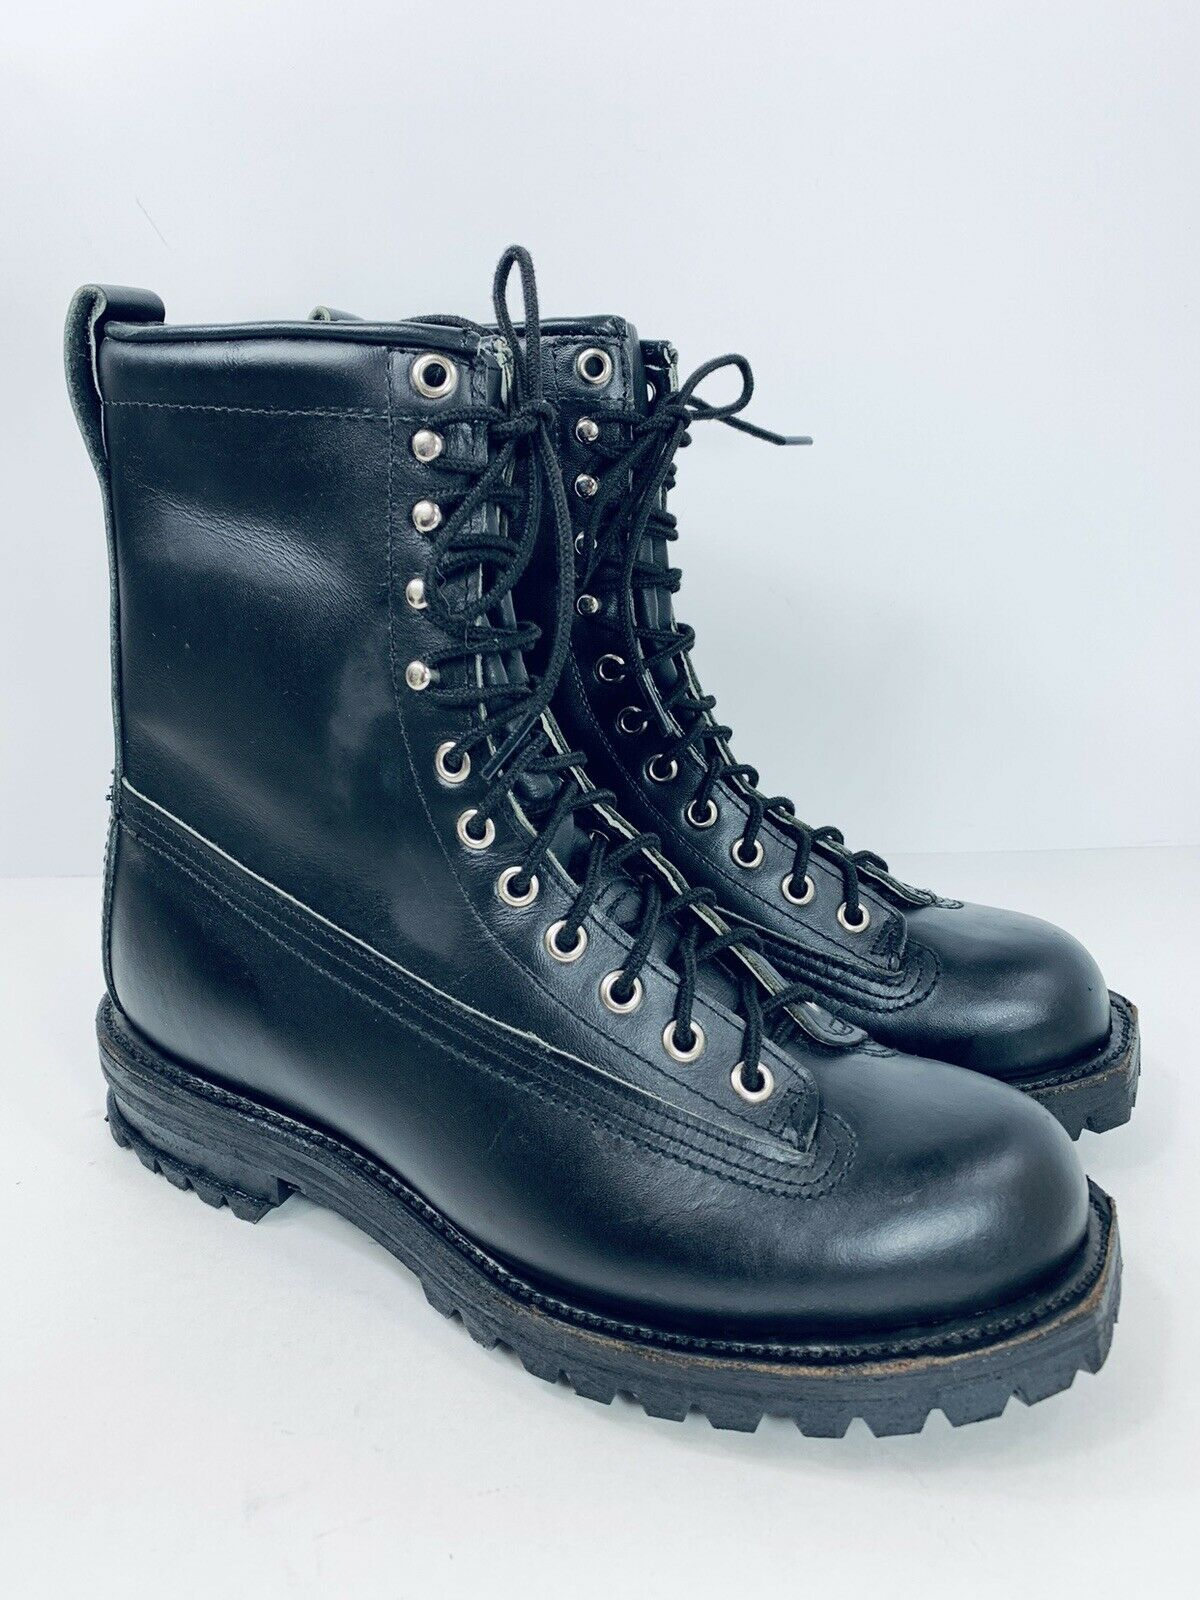 Vtg Black Leather Logger Motorcycle Firefighter Vibram Steel Toe Boots Mens 8 D